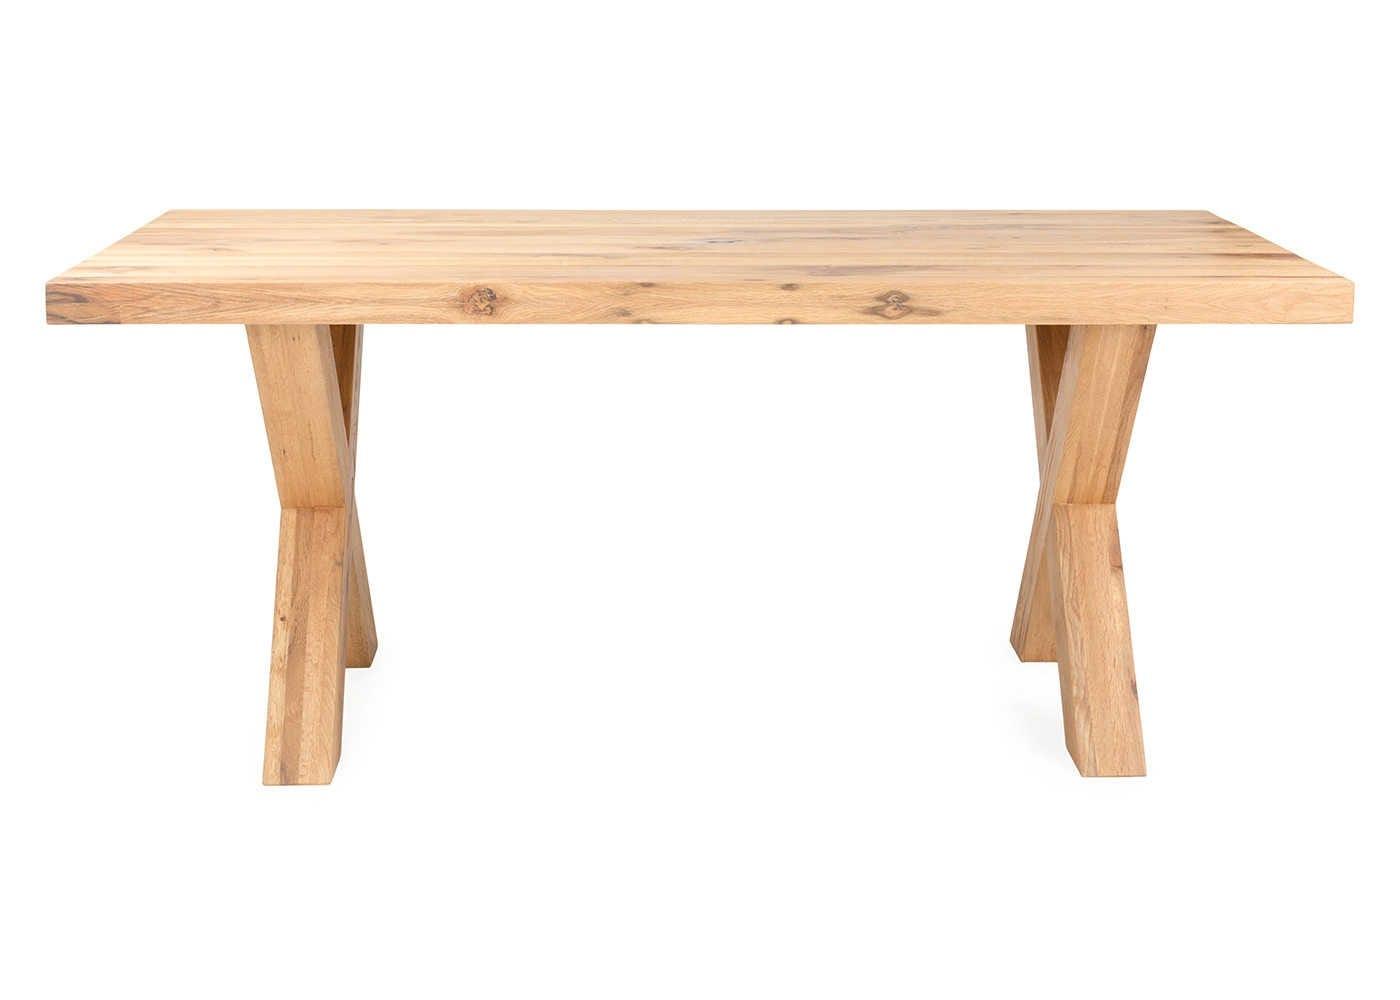 Trentino Table in Natural Oak